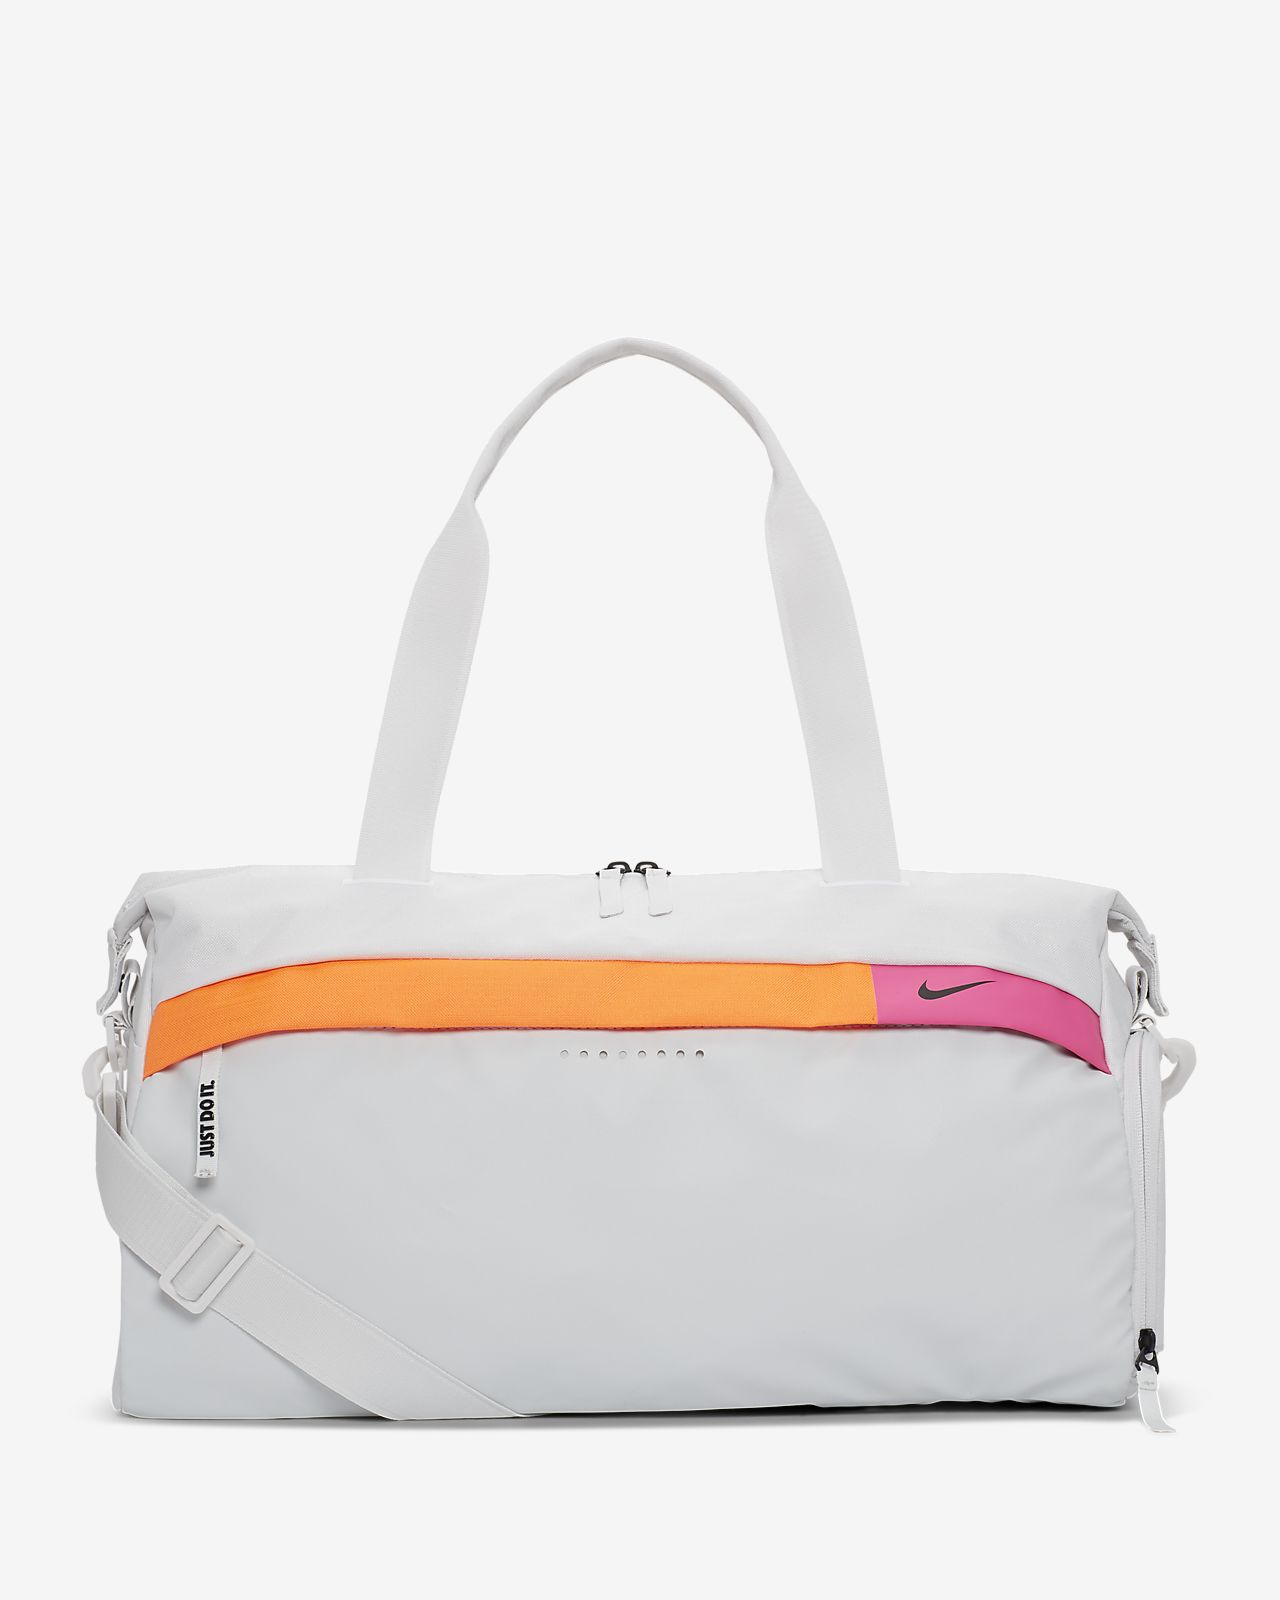 Nike Radiate Women's Graphic Training Duffel Bag